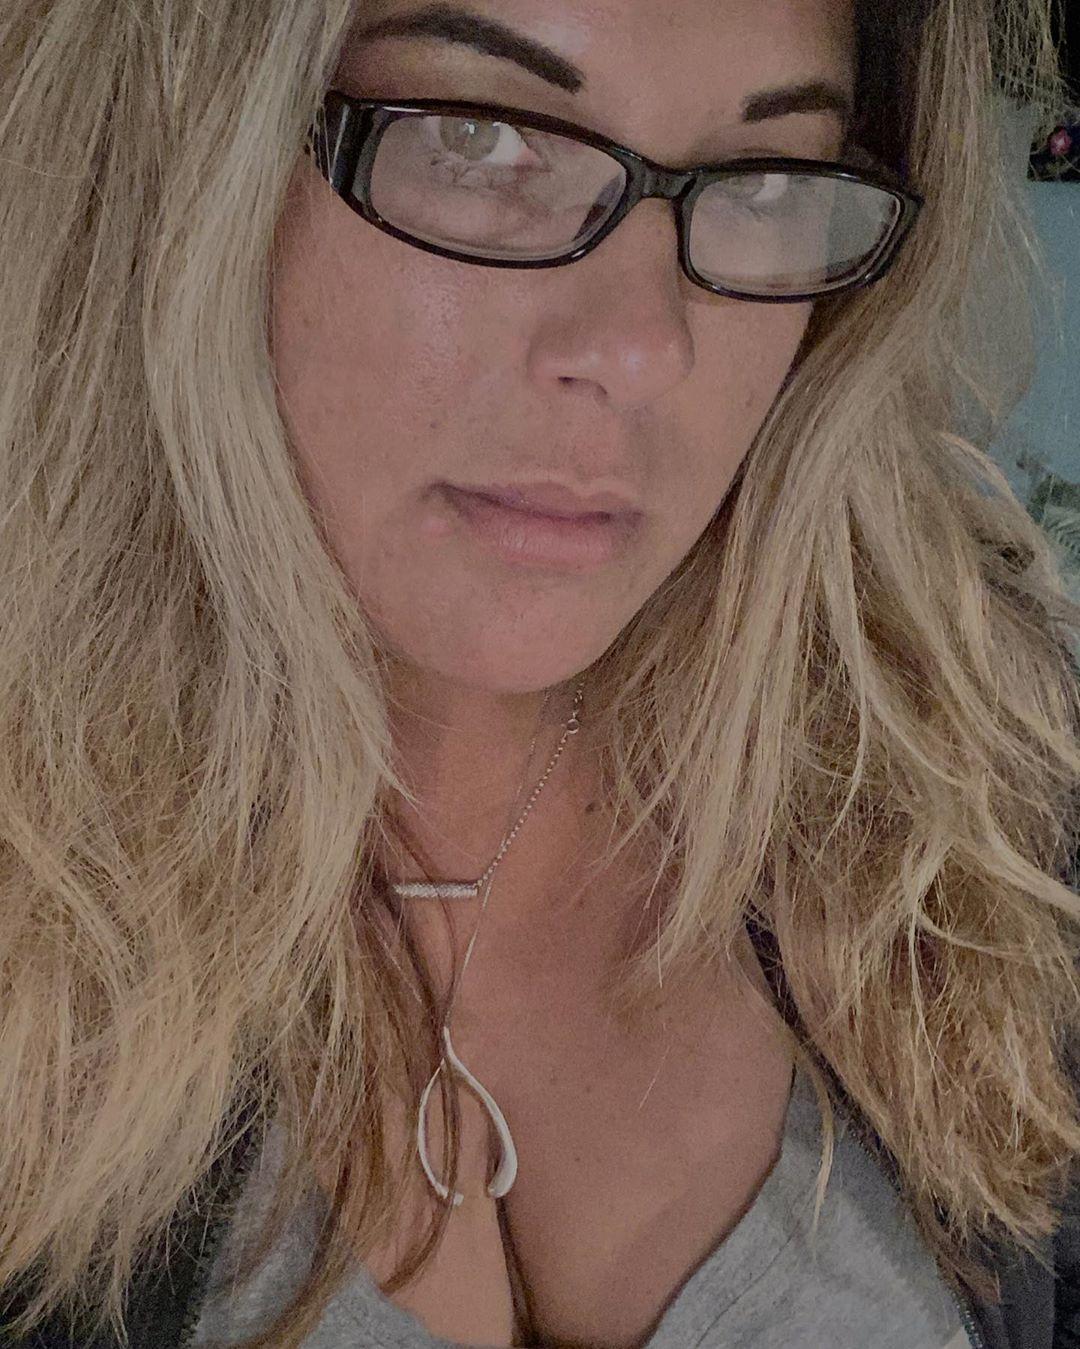 Rain, rain, go away, I need to walk out on the beach and lay.....summer, wait, please, come back.....😥 #juliethrewtheglass #summer #dontleaveme #comeback #rainraingoaway #beachtime #bringbacksummer #wheresmine #endlesssummer #please #stuckinside #newglasses #bifocals #saywhat #heyoldlady @juliethrewtheglass #instaselfie #myshot